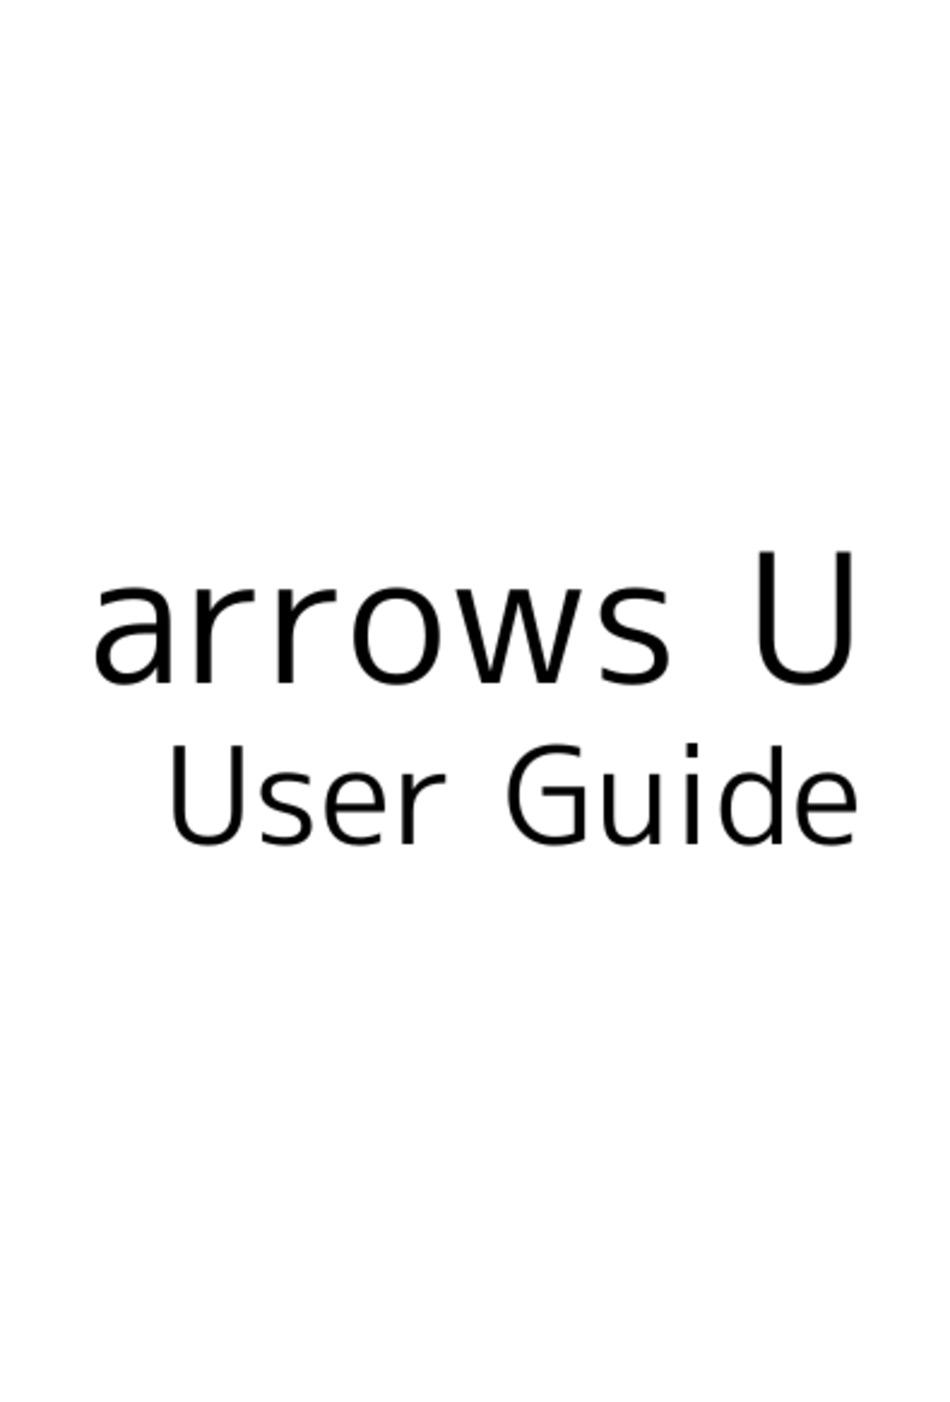 U arrows Electronic Components